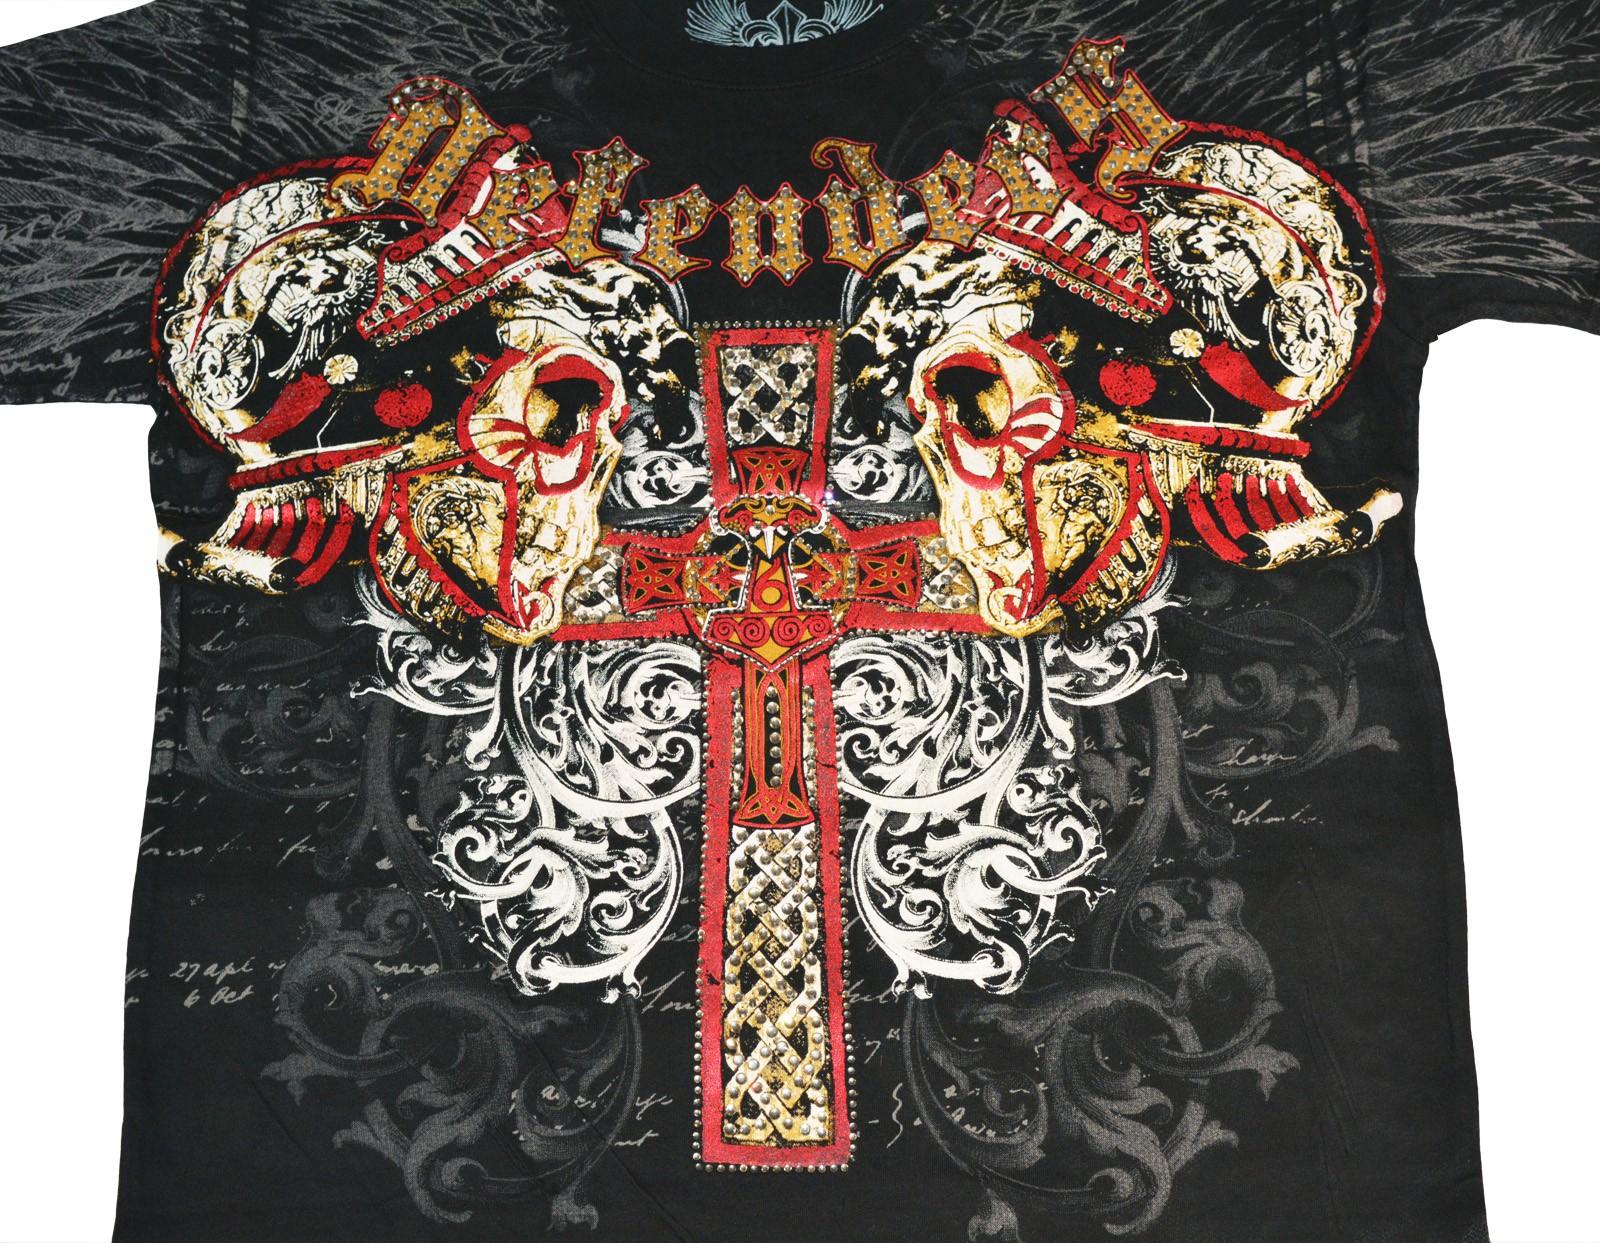 Xzavier - Defenders Rhinestones/Strass T-Shirt Detail